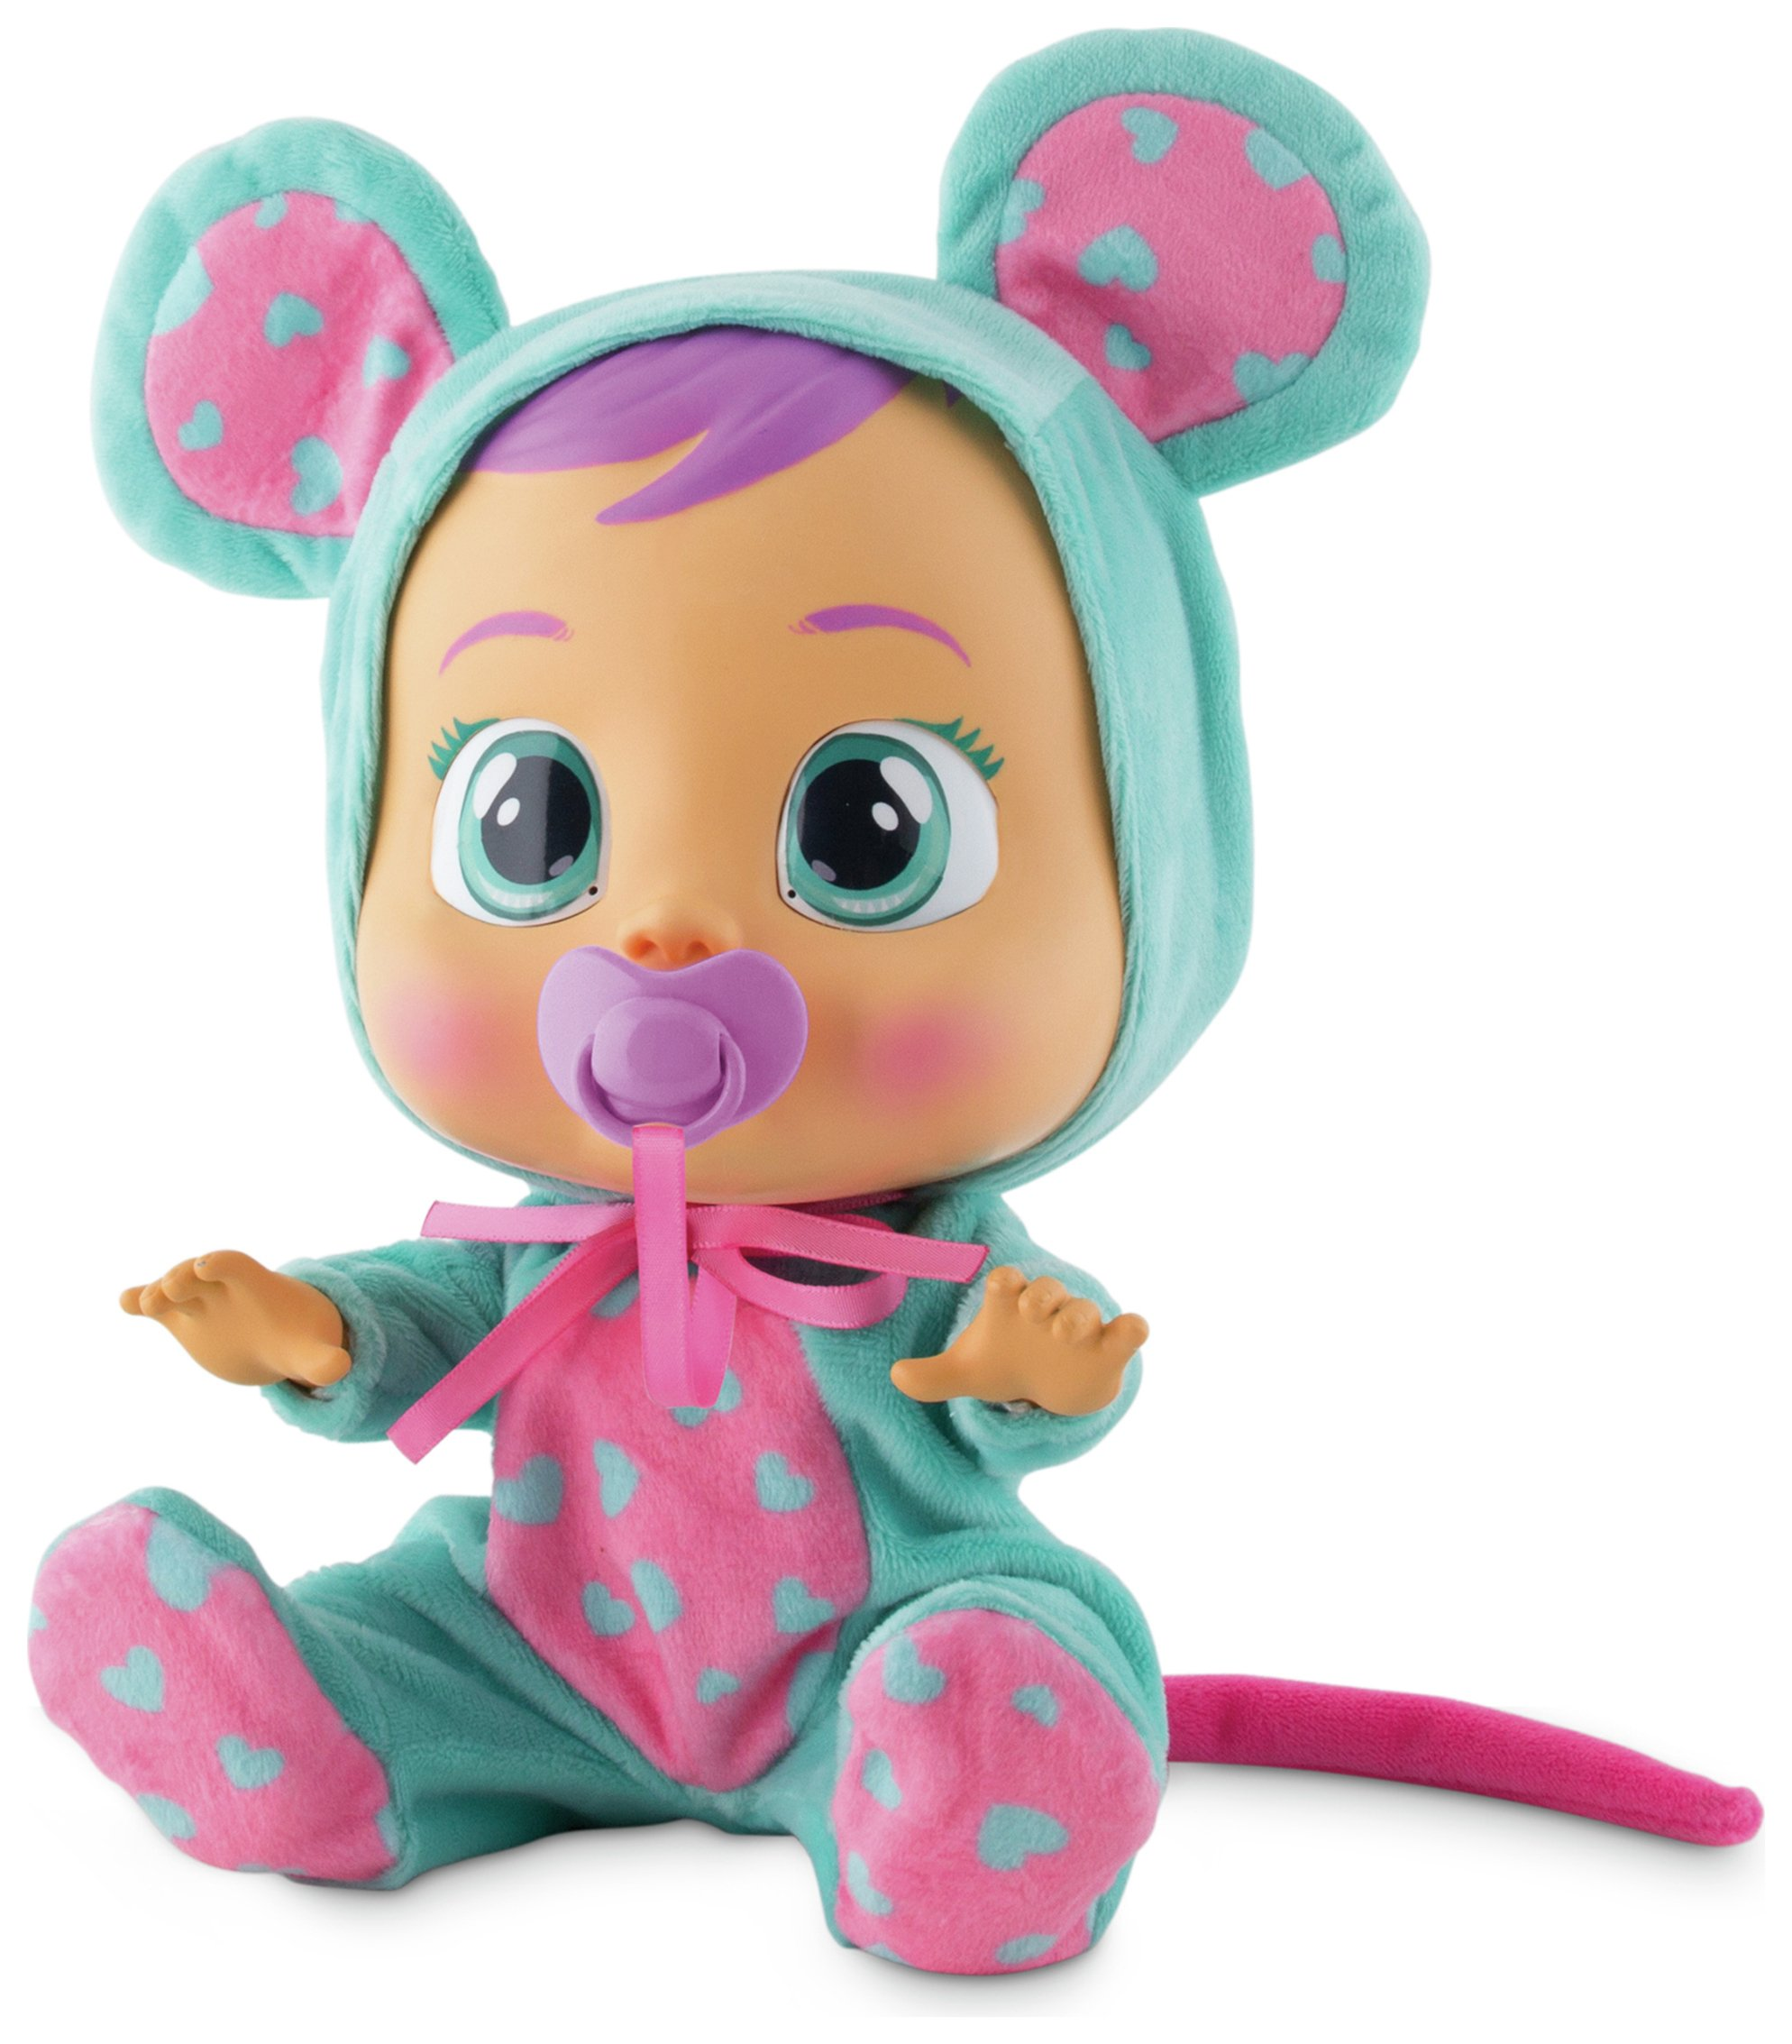 Image of Cry Babies La La.